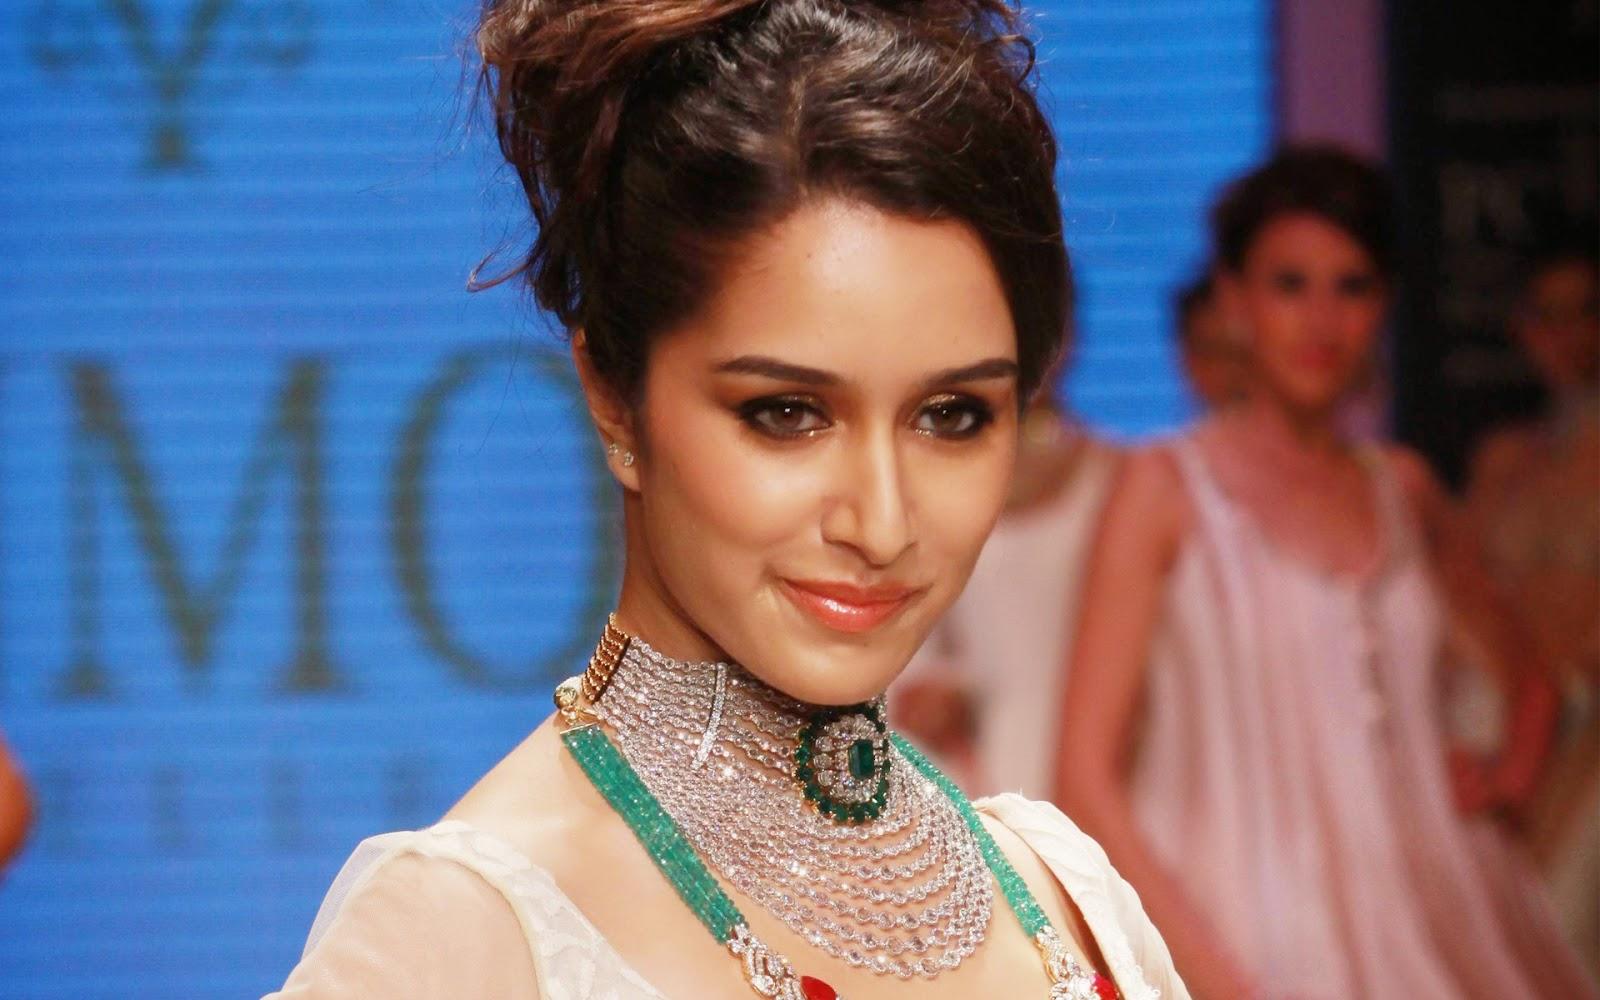 Ek Villain Fame Shraddha Kapoor Latest Hot HD Wallpaper